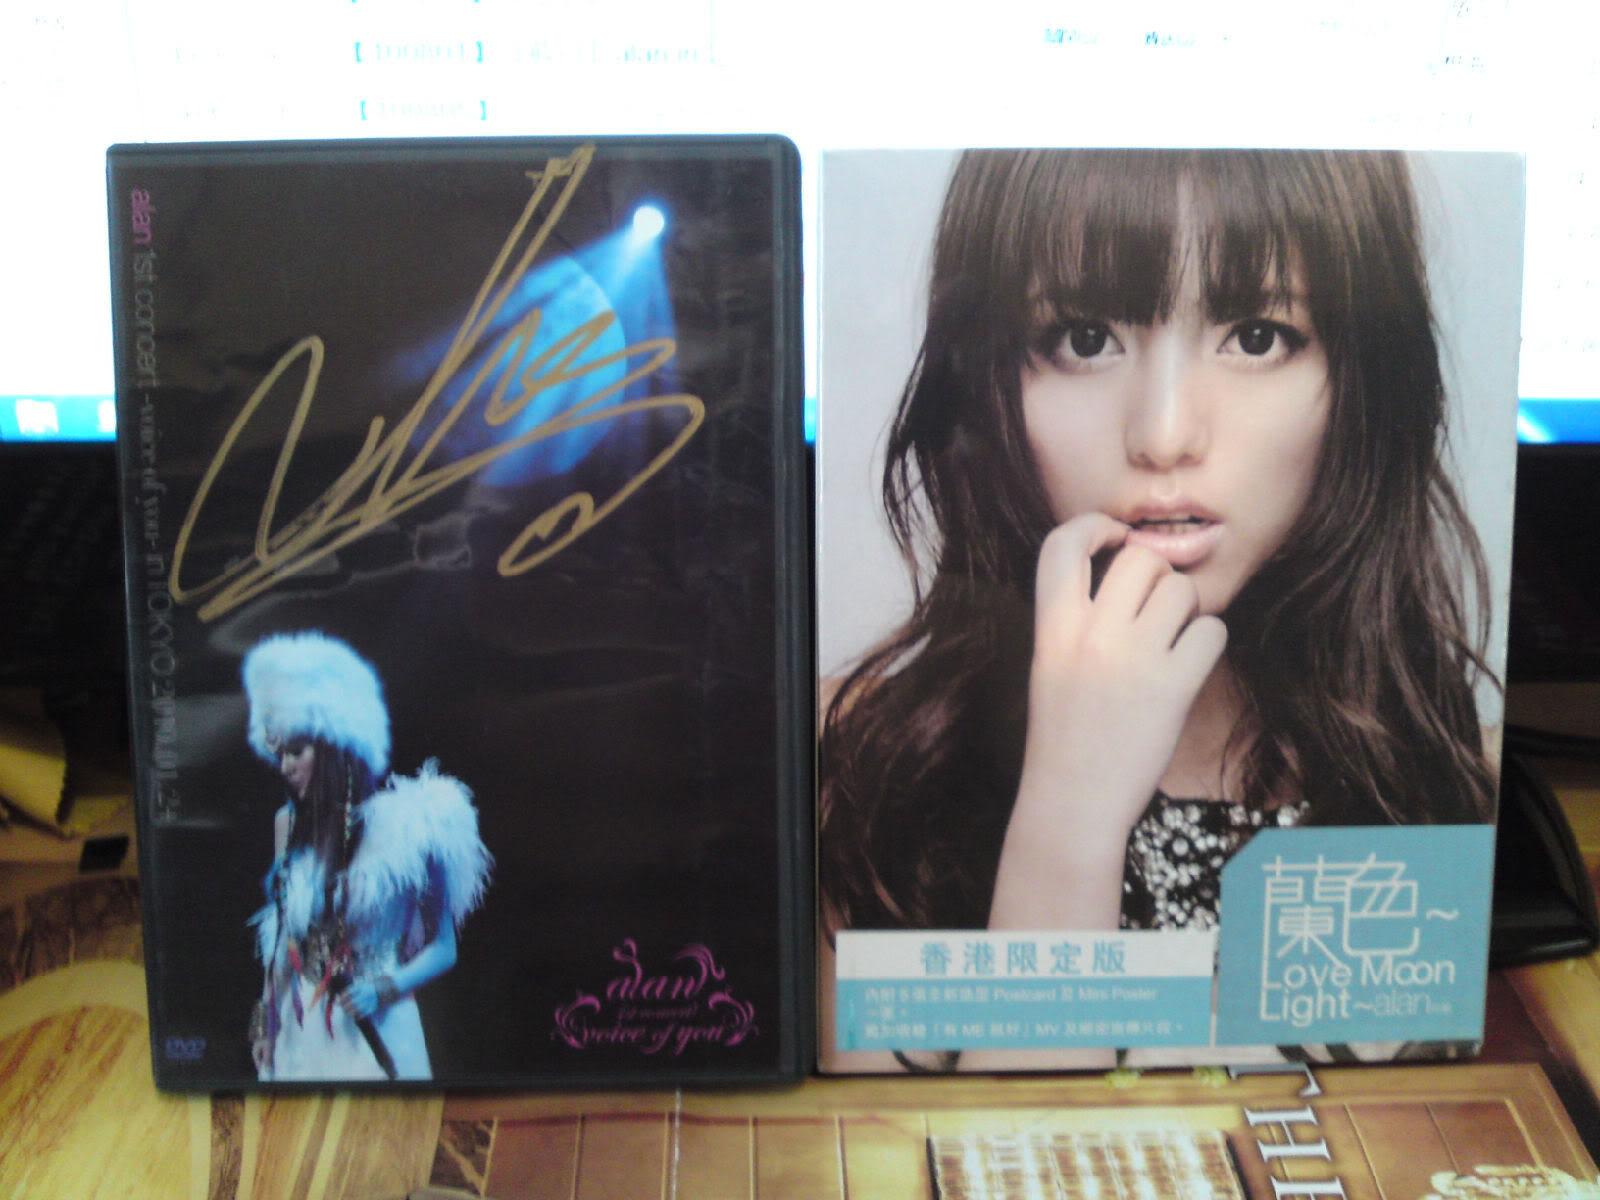 [Official] New Mandarin EP: 蘭色~Love Moon Light~ - Page 8 B7ee2ddf98fc3de3cf116671